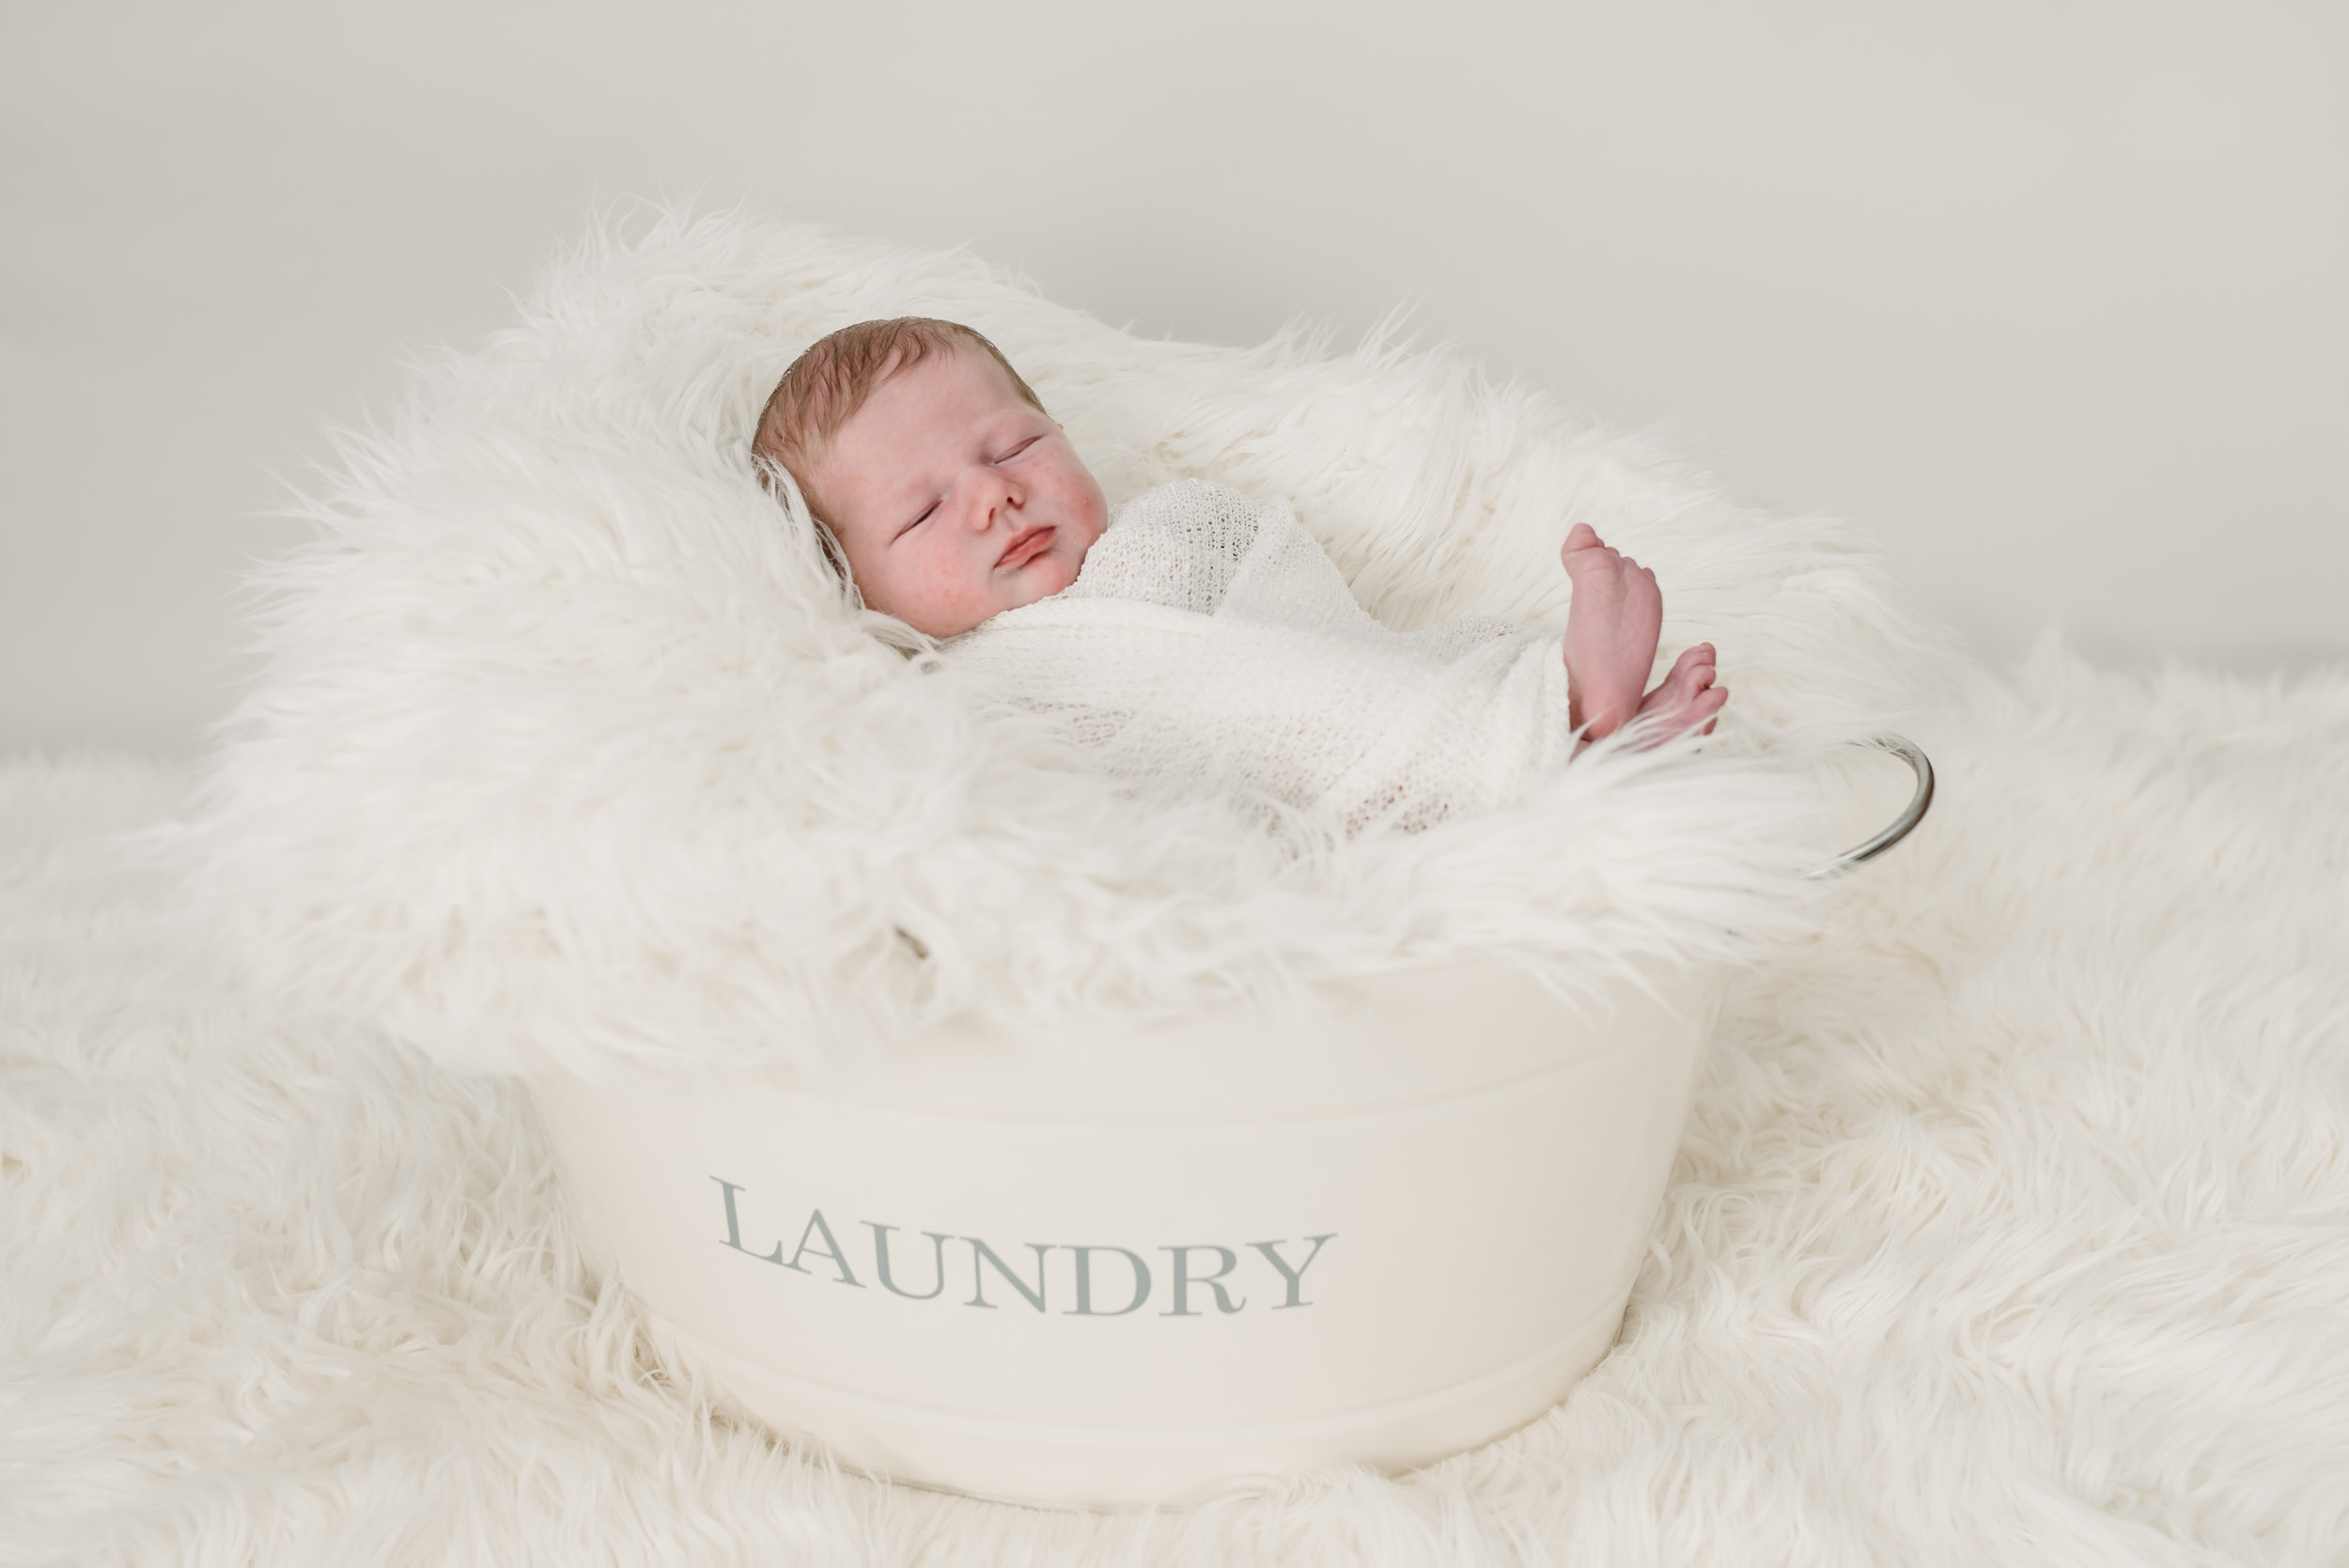 Newborn photographer - Clitheroe, Lancashire